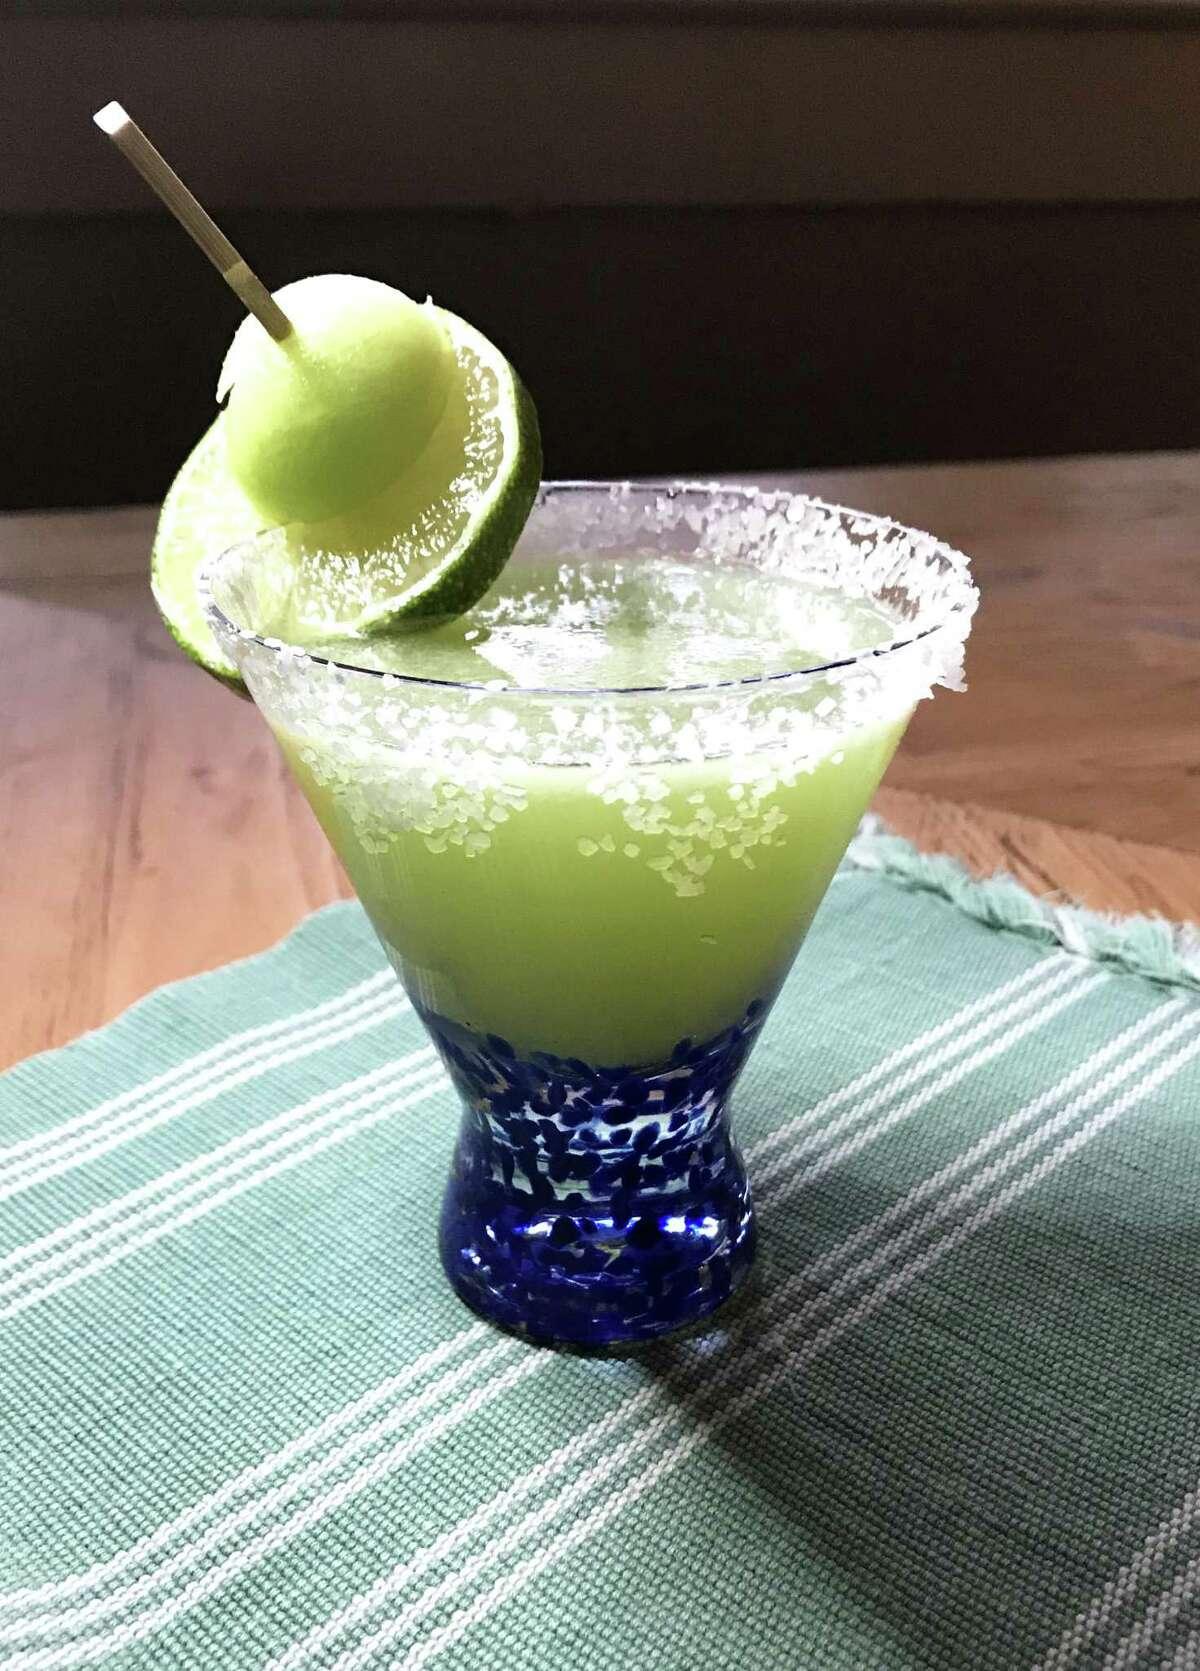 Honeydew Margarita, made with honeydew juice